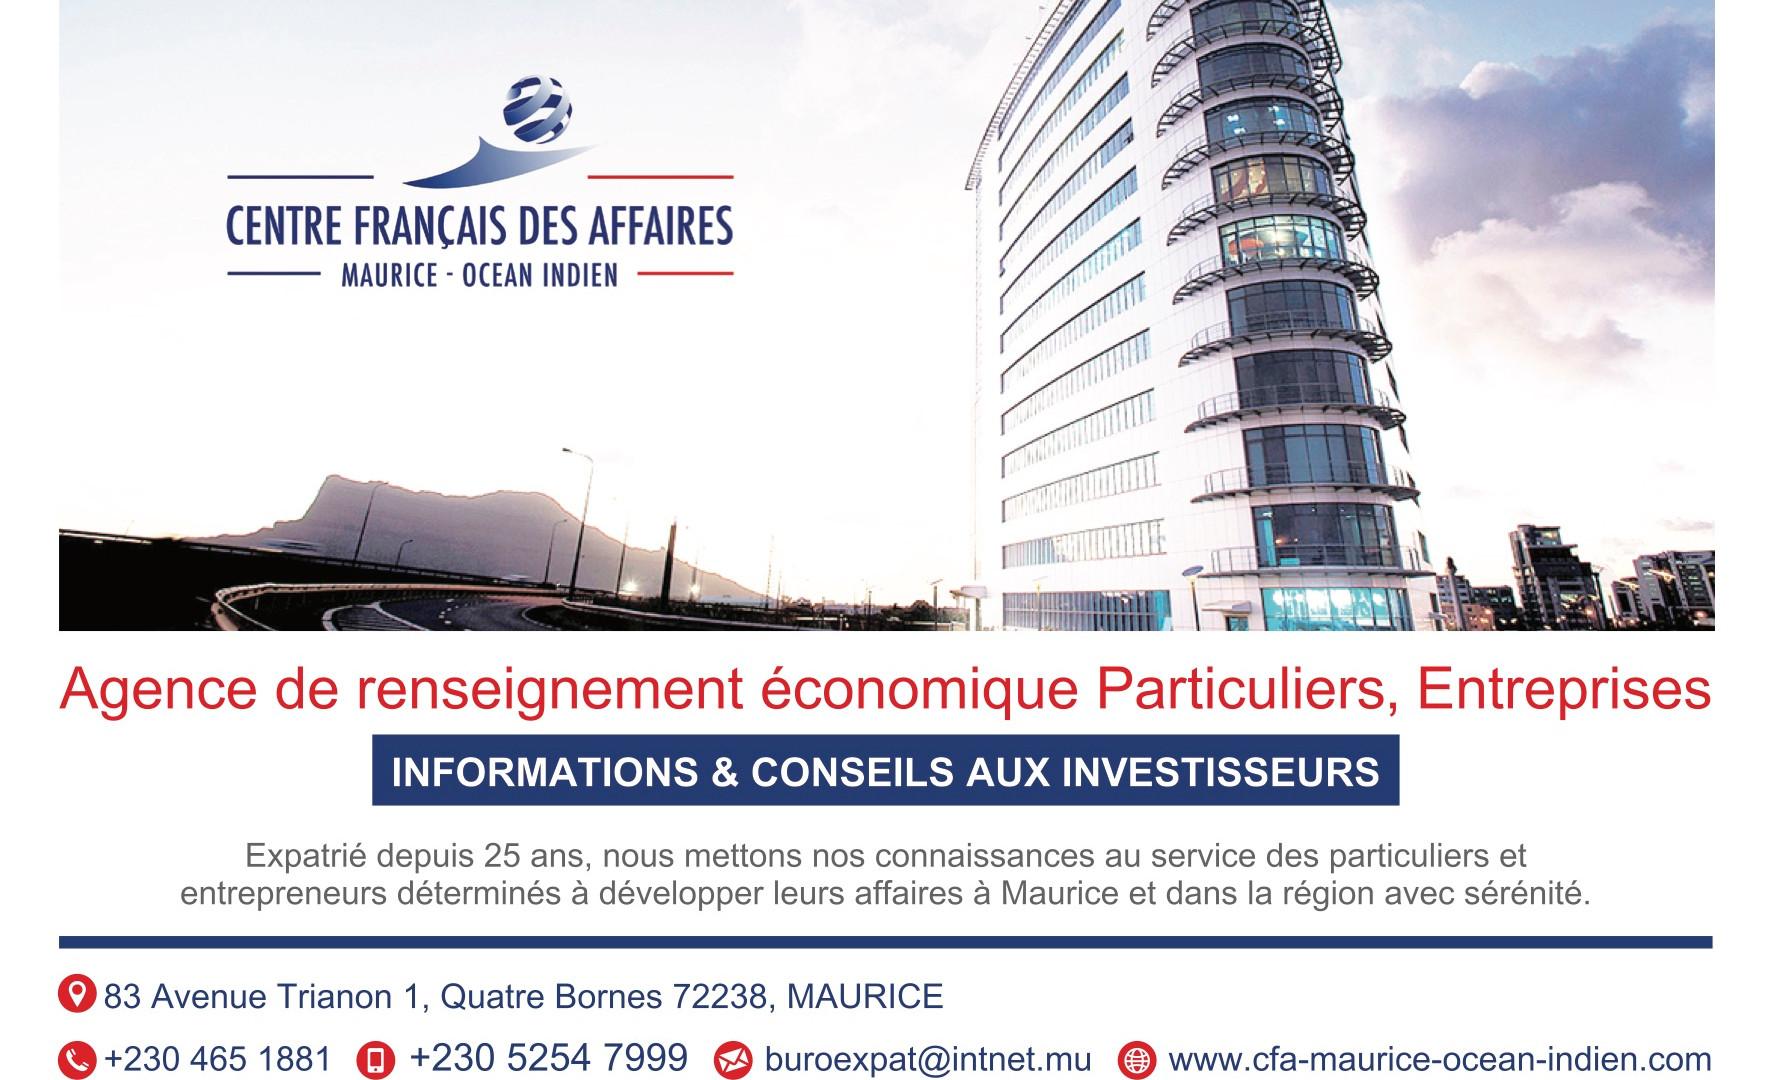 Centre Français des Affaires